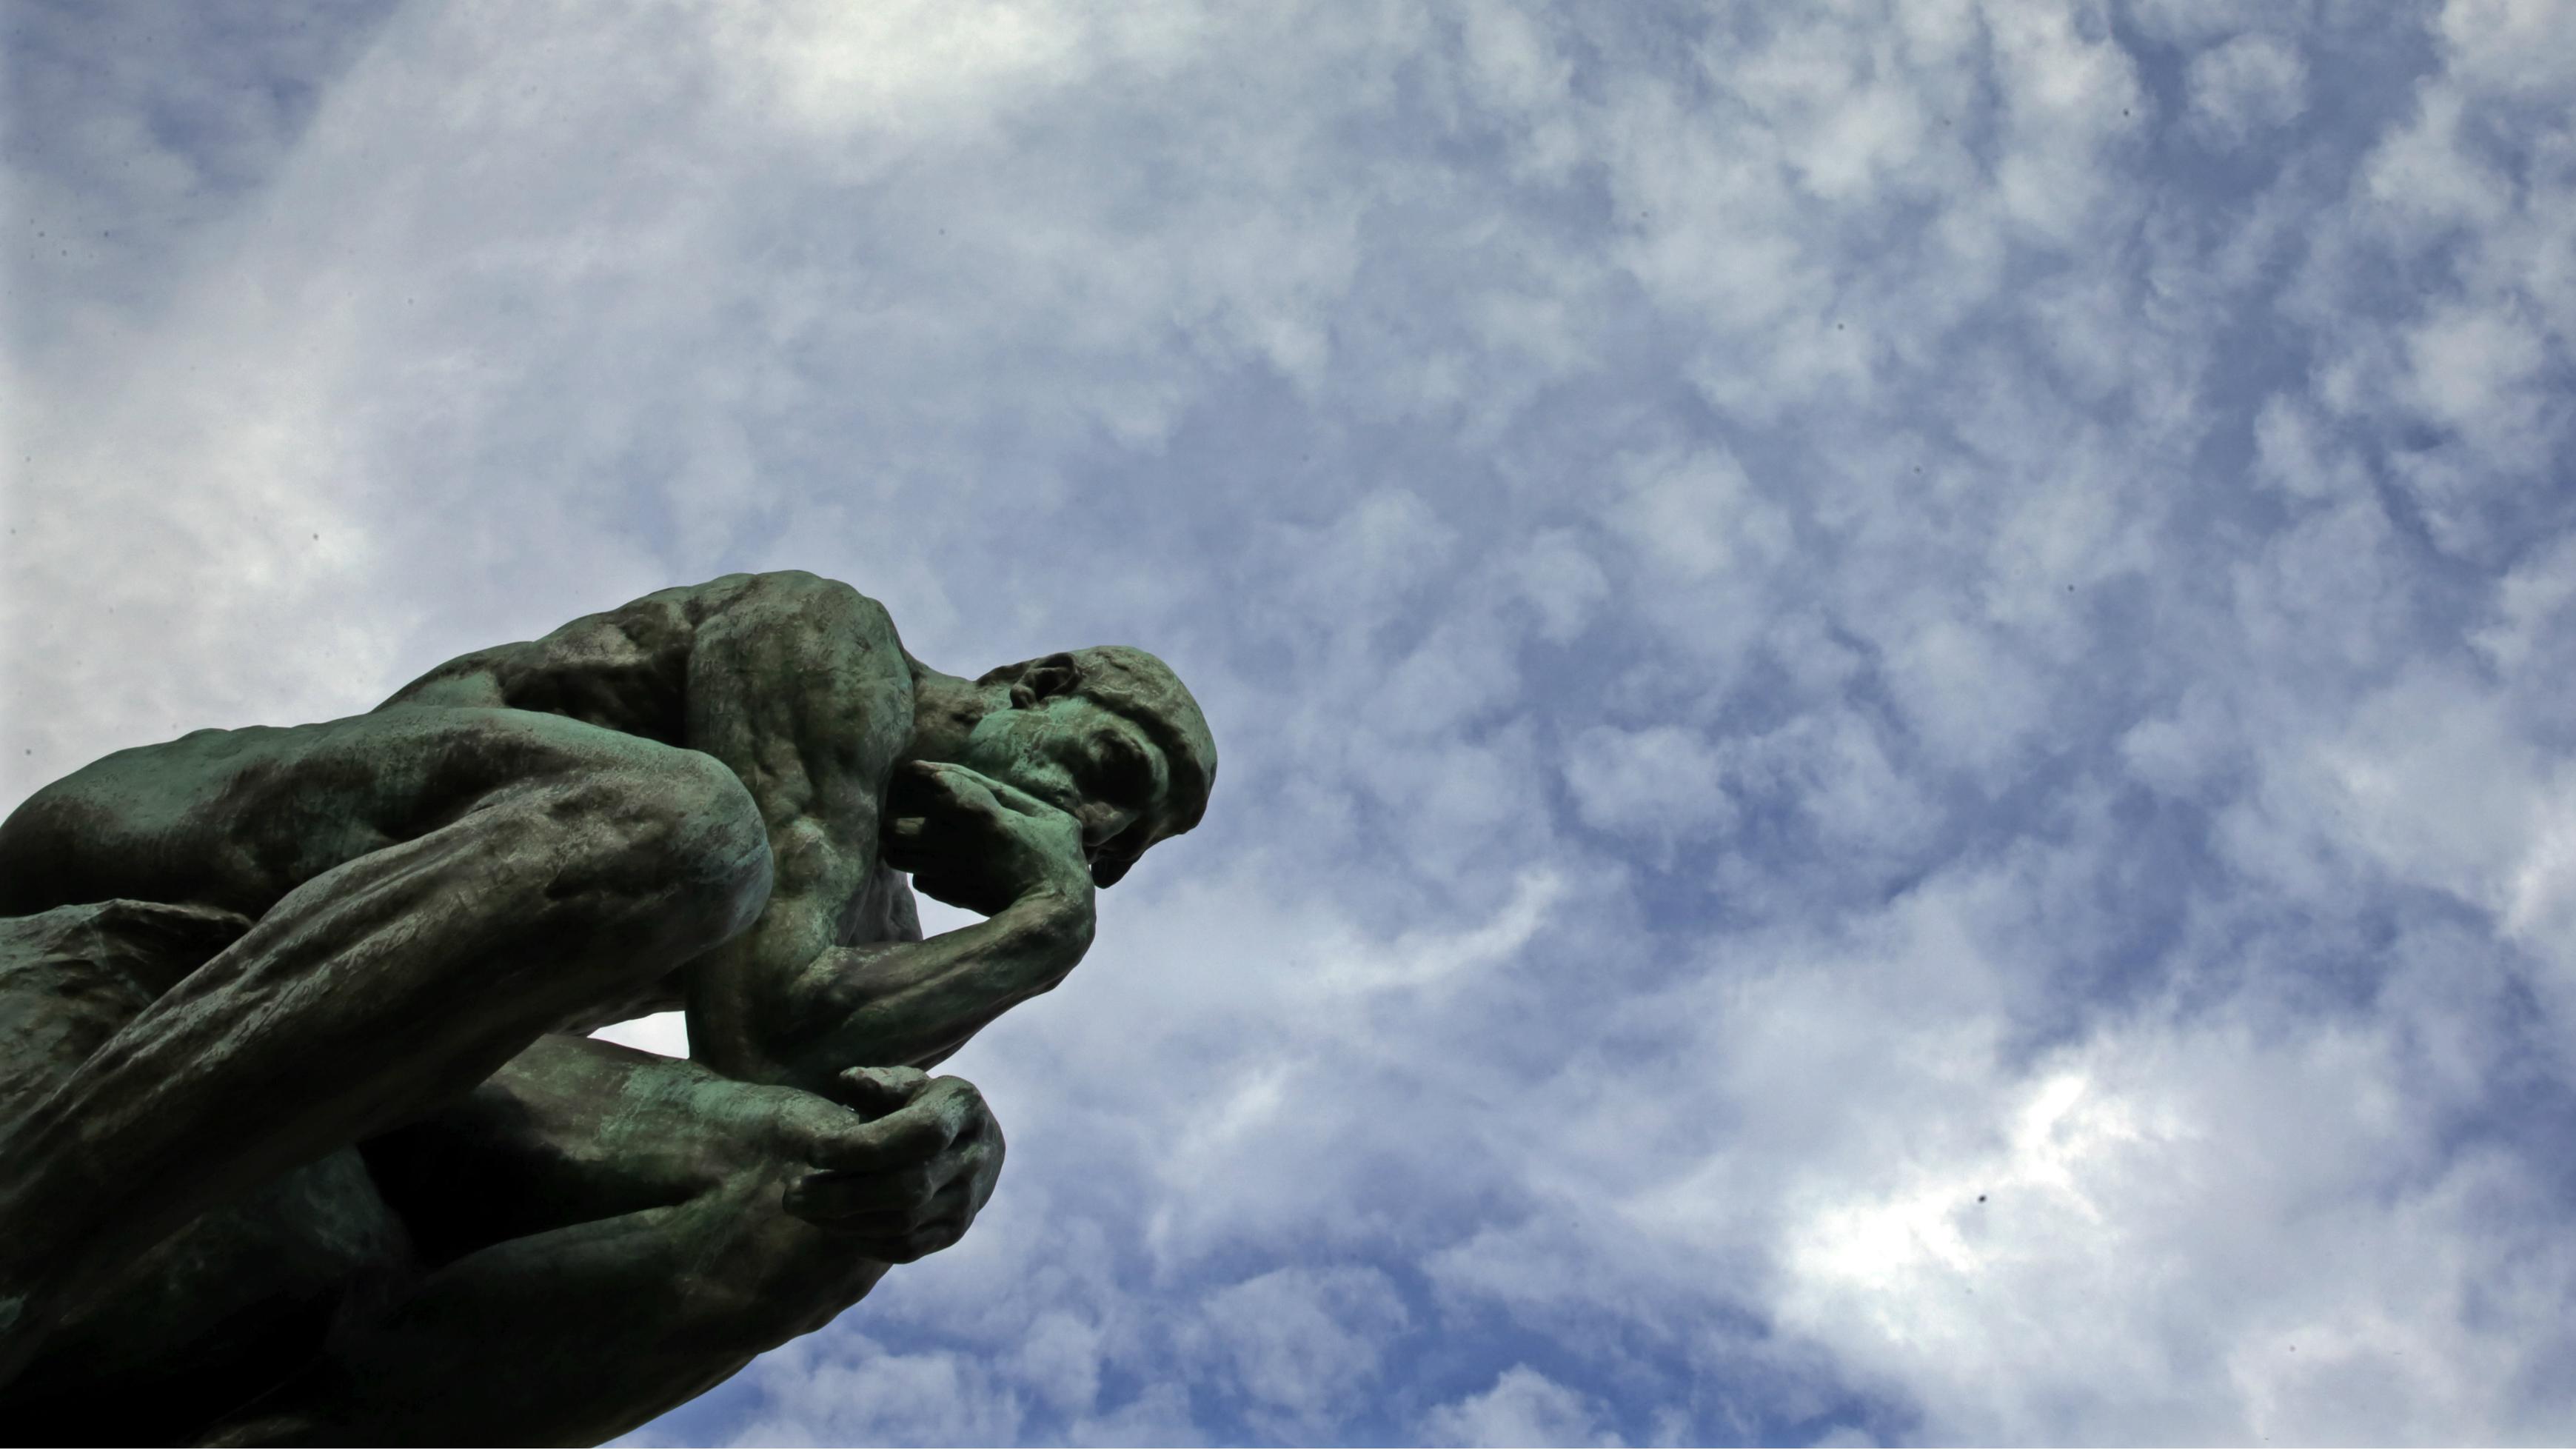 Rodin's sculpture The Thinker